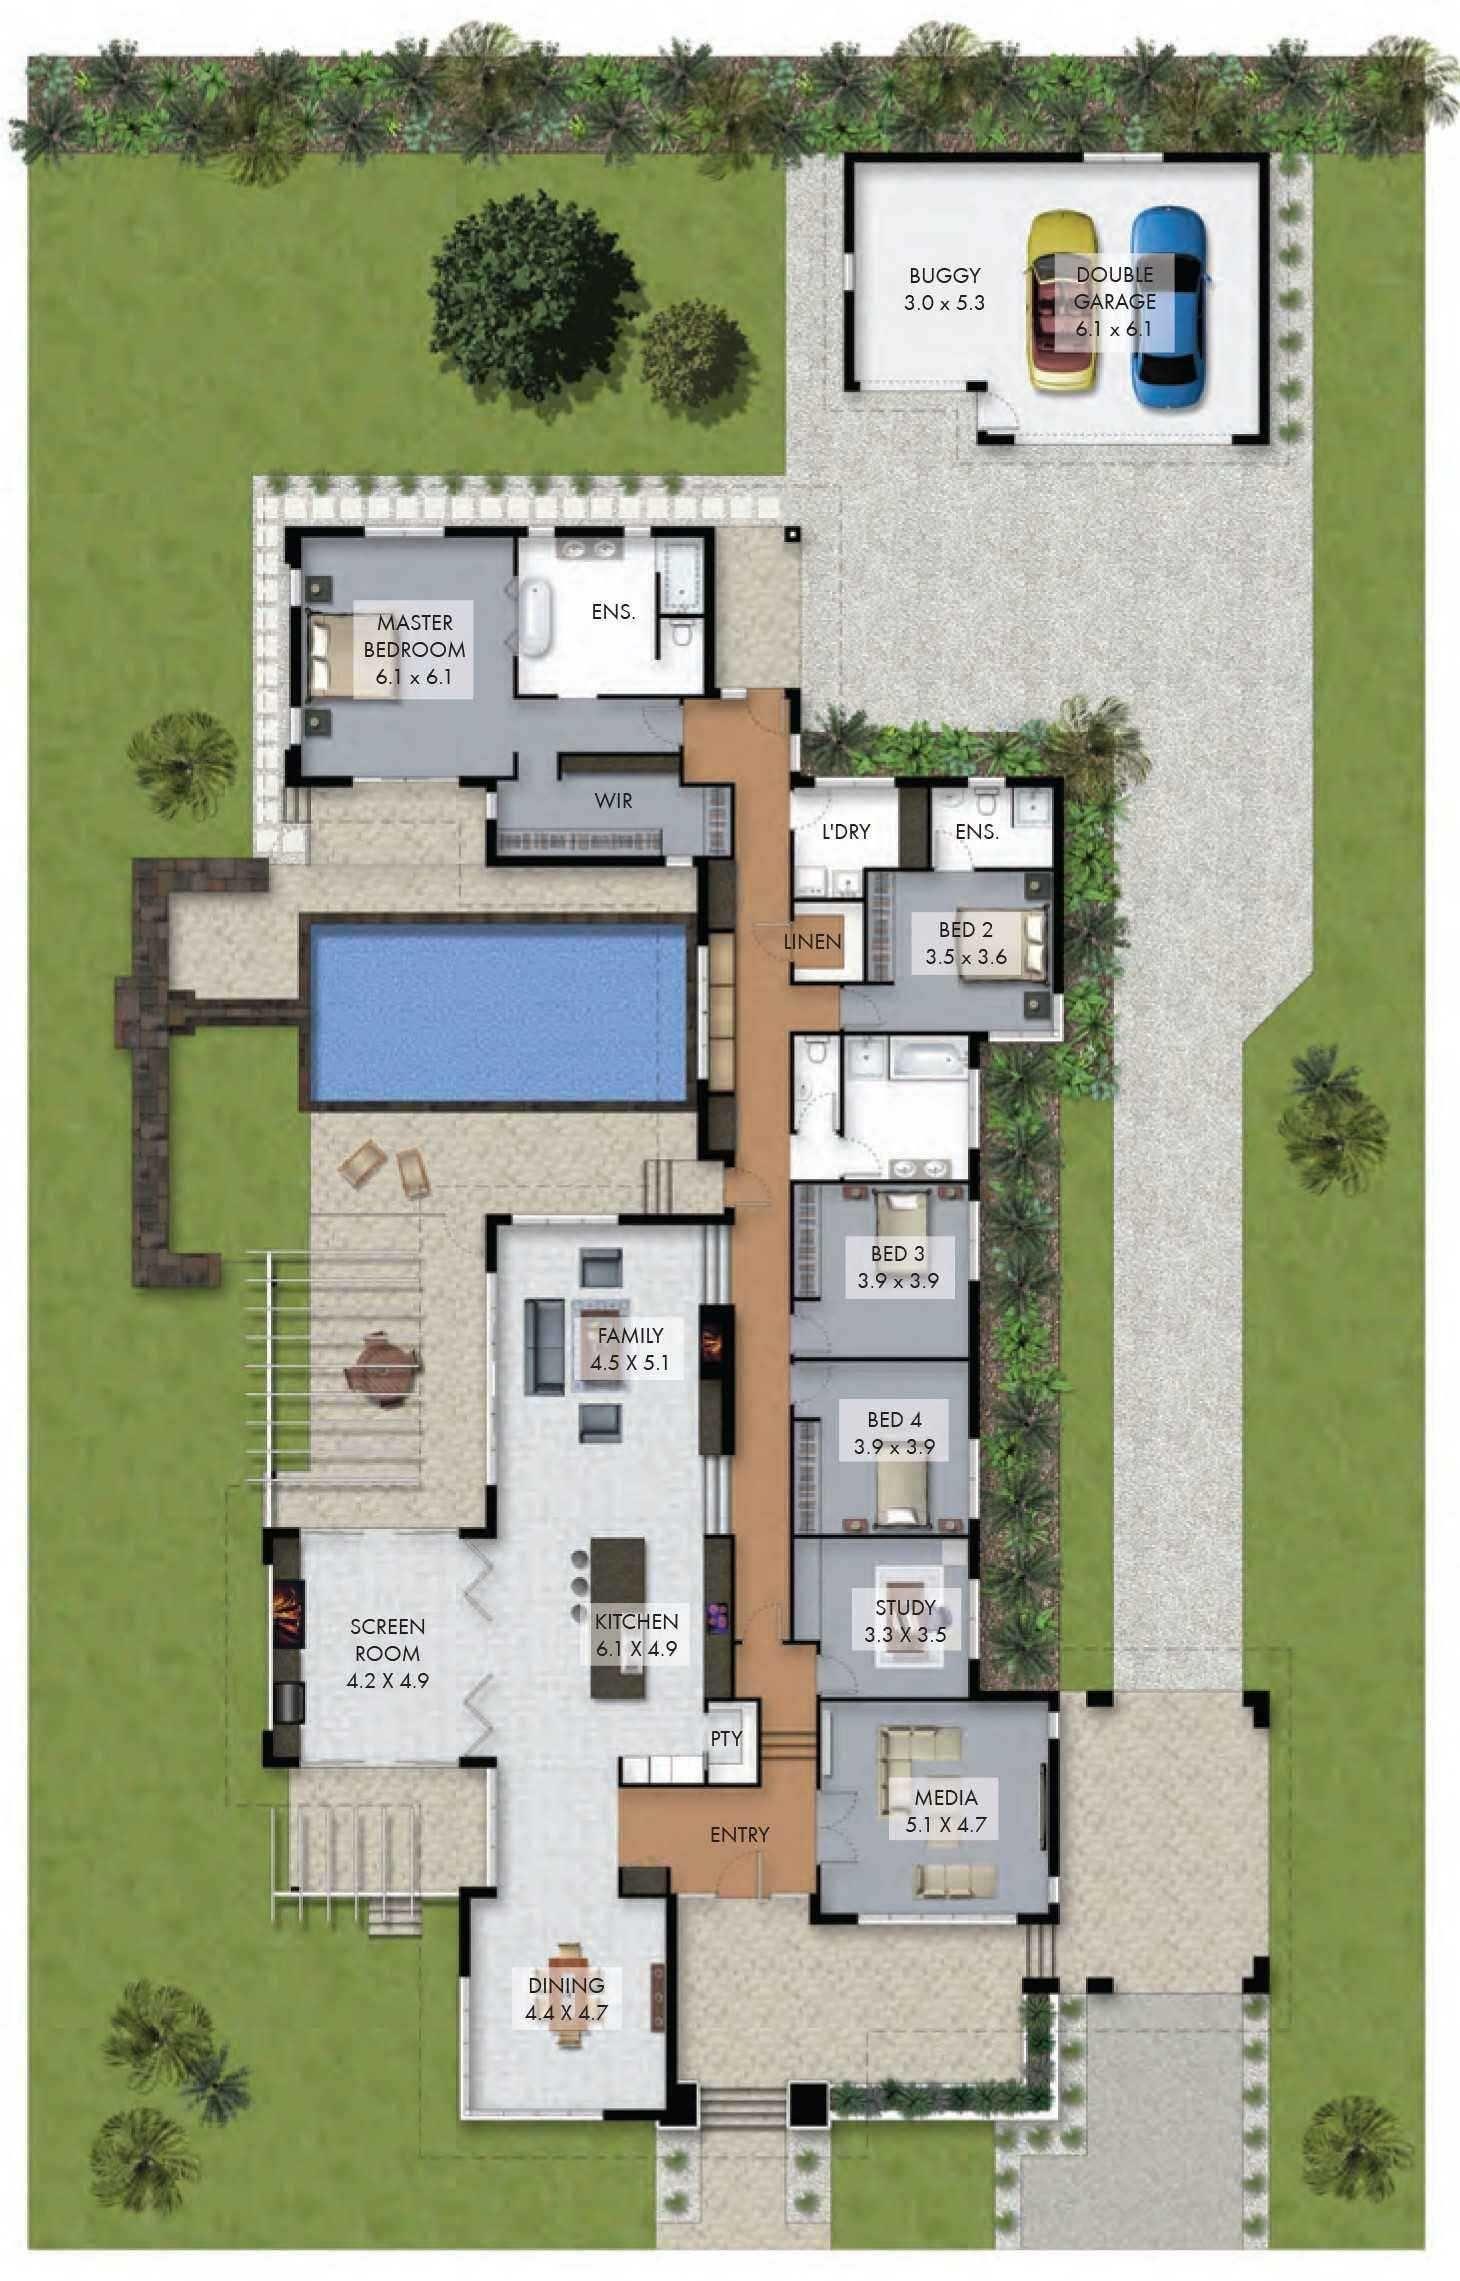 Luxury 4 Bedroom House Plans Single Story House Storey